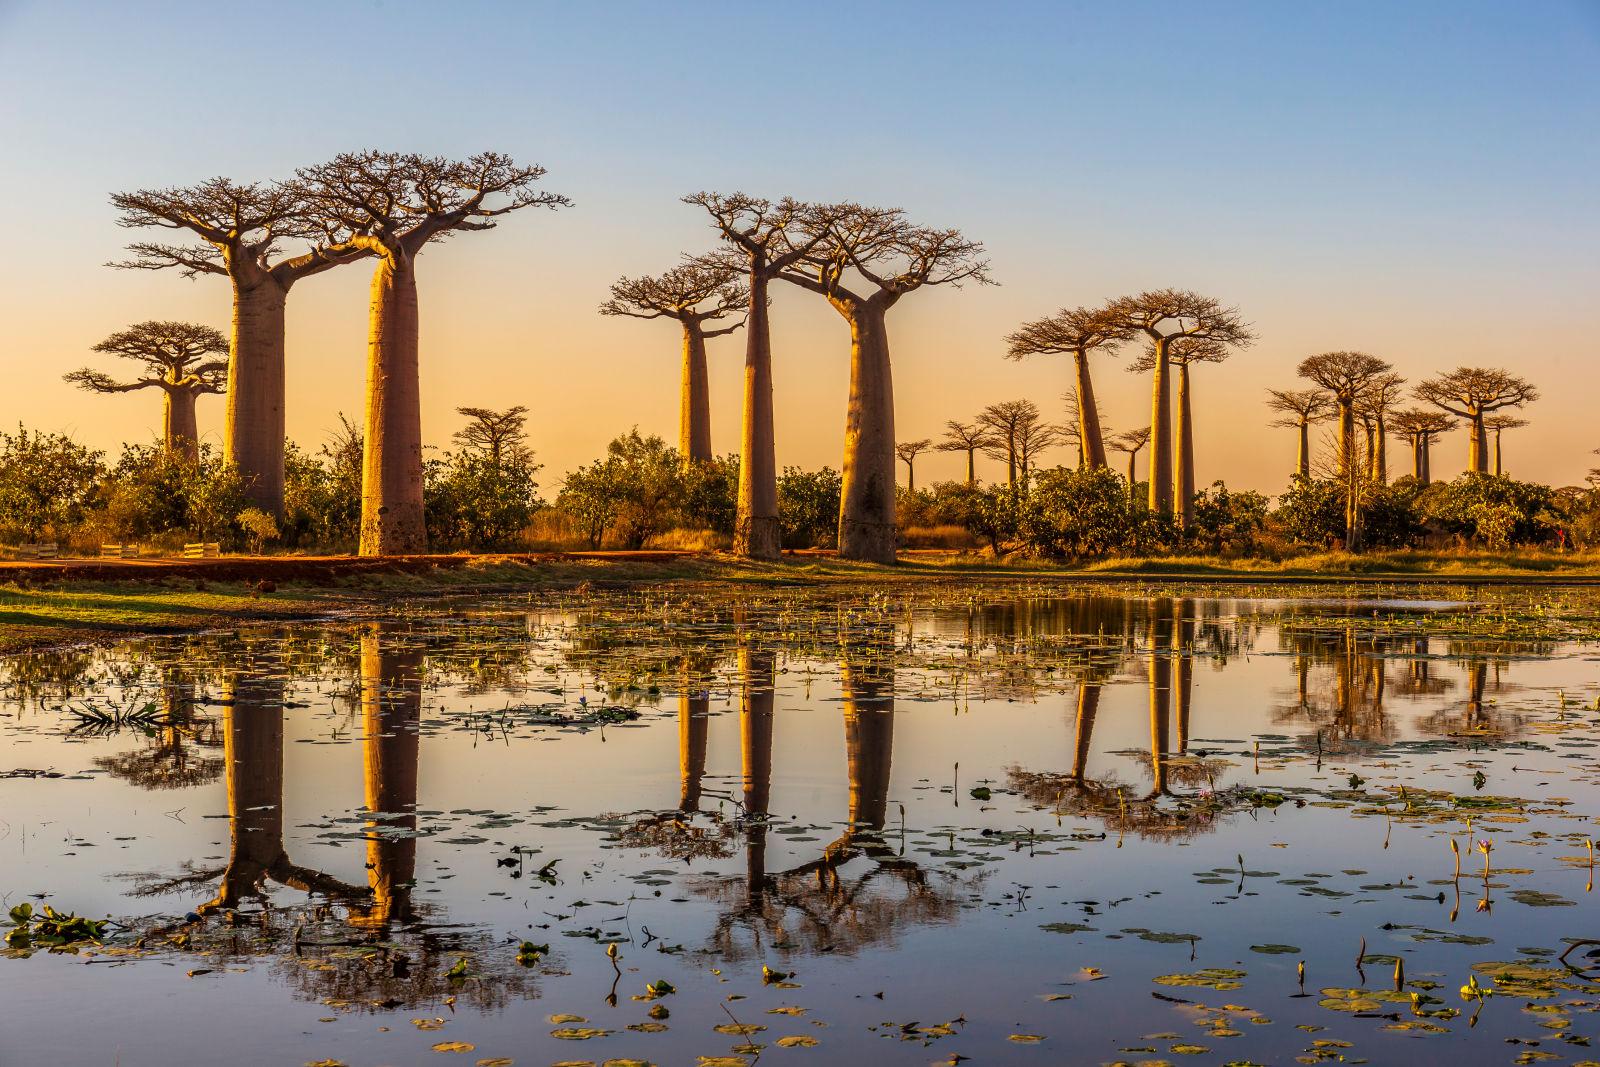 Baobab Bäume in Madagaskar bei Sonnenaufgang